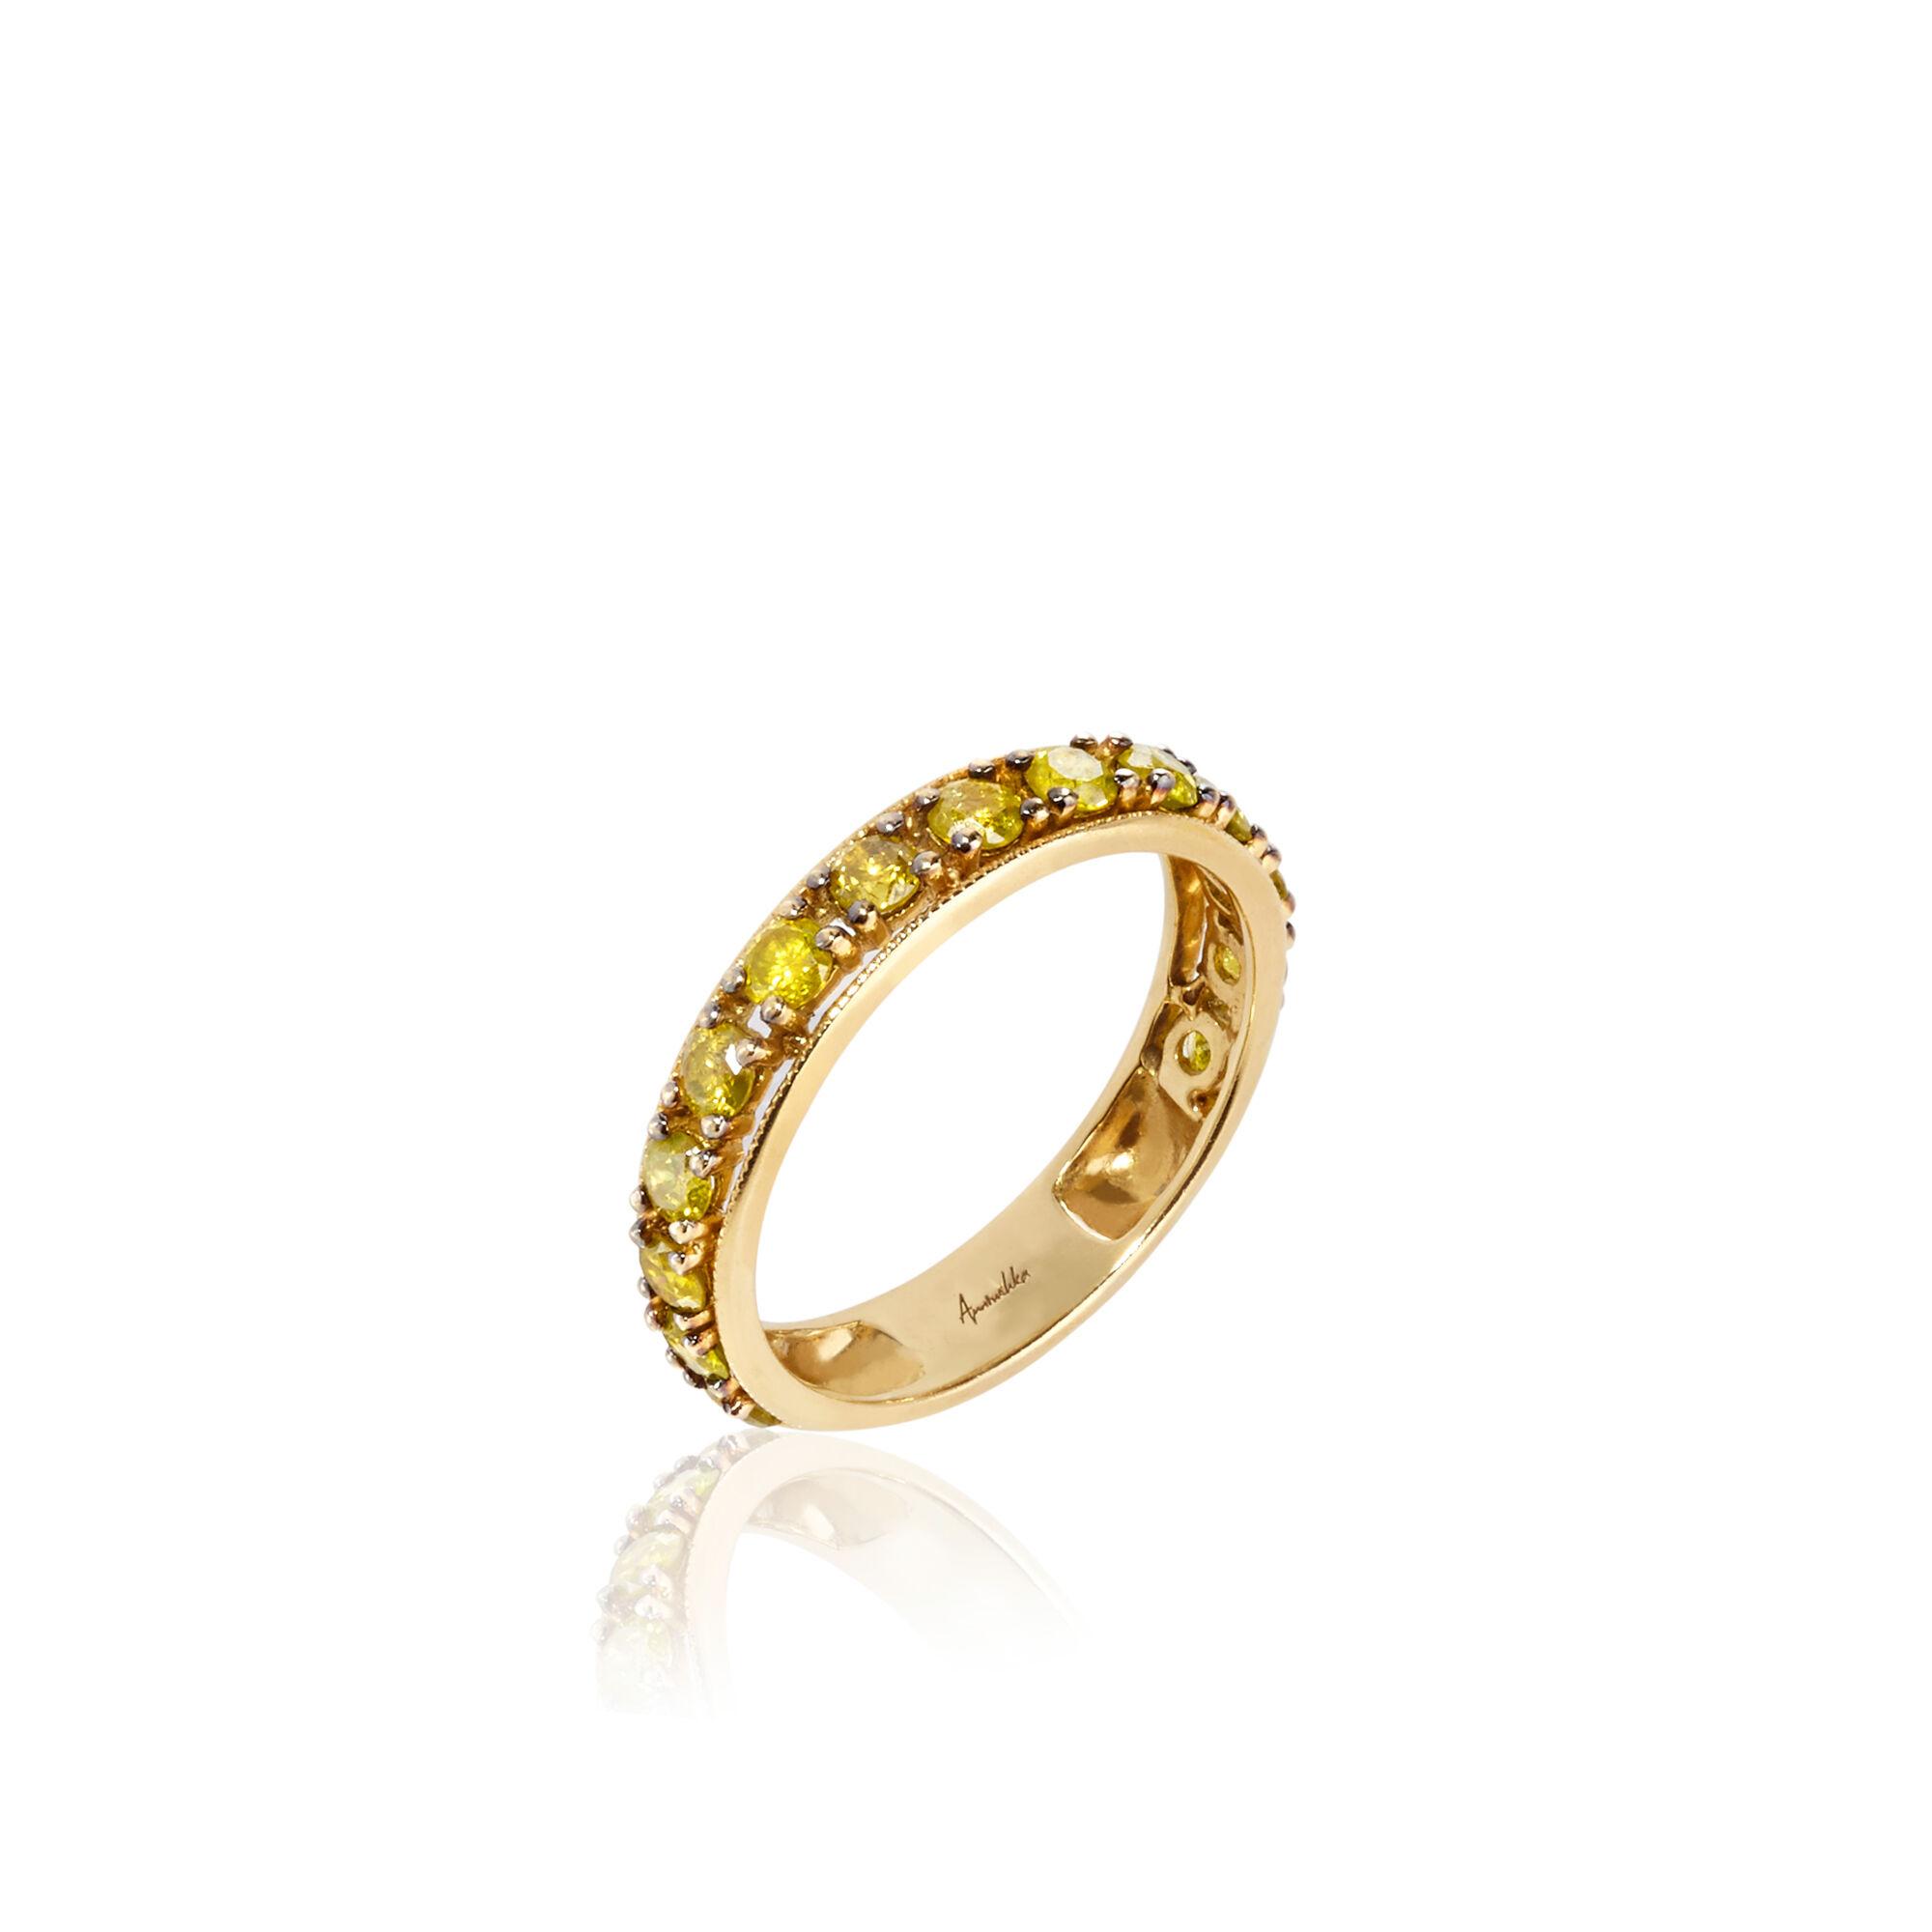 dusty diamonds 18ct yellow gold eternity ring annoushka uk. Black Bedroom Furniture Sets. Home Design Ideas